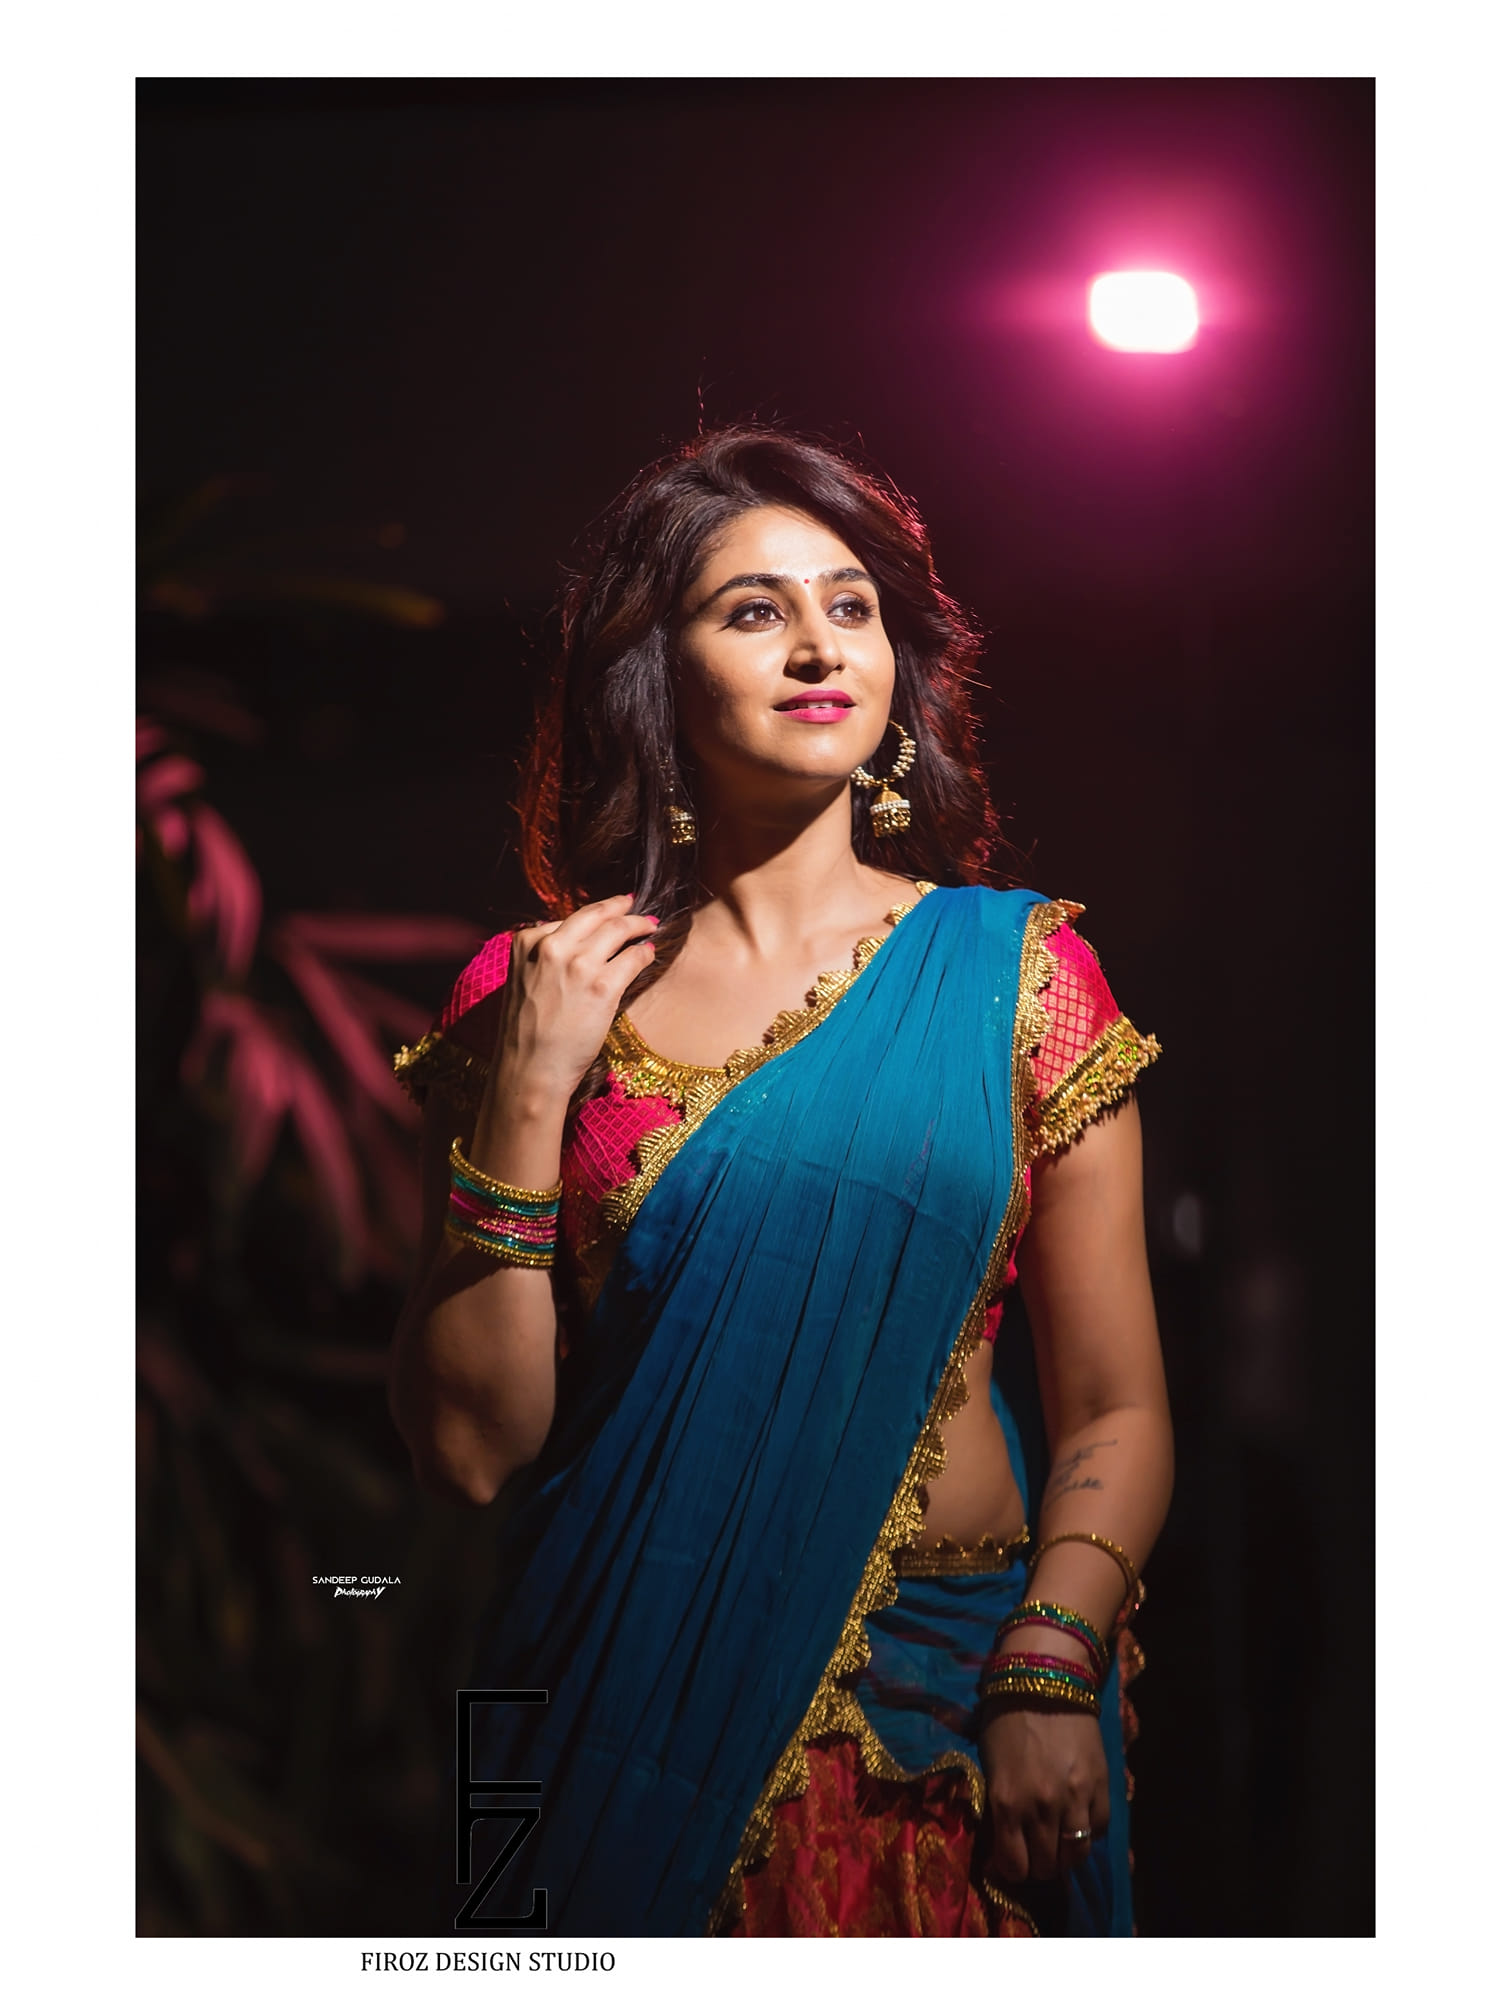 Glamorous Varshini looked beautiful in   Firoz Design Studio half saree. 2021-04-19